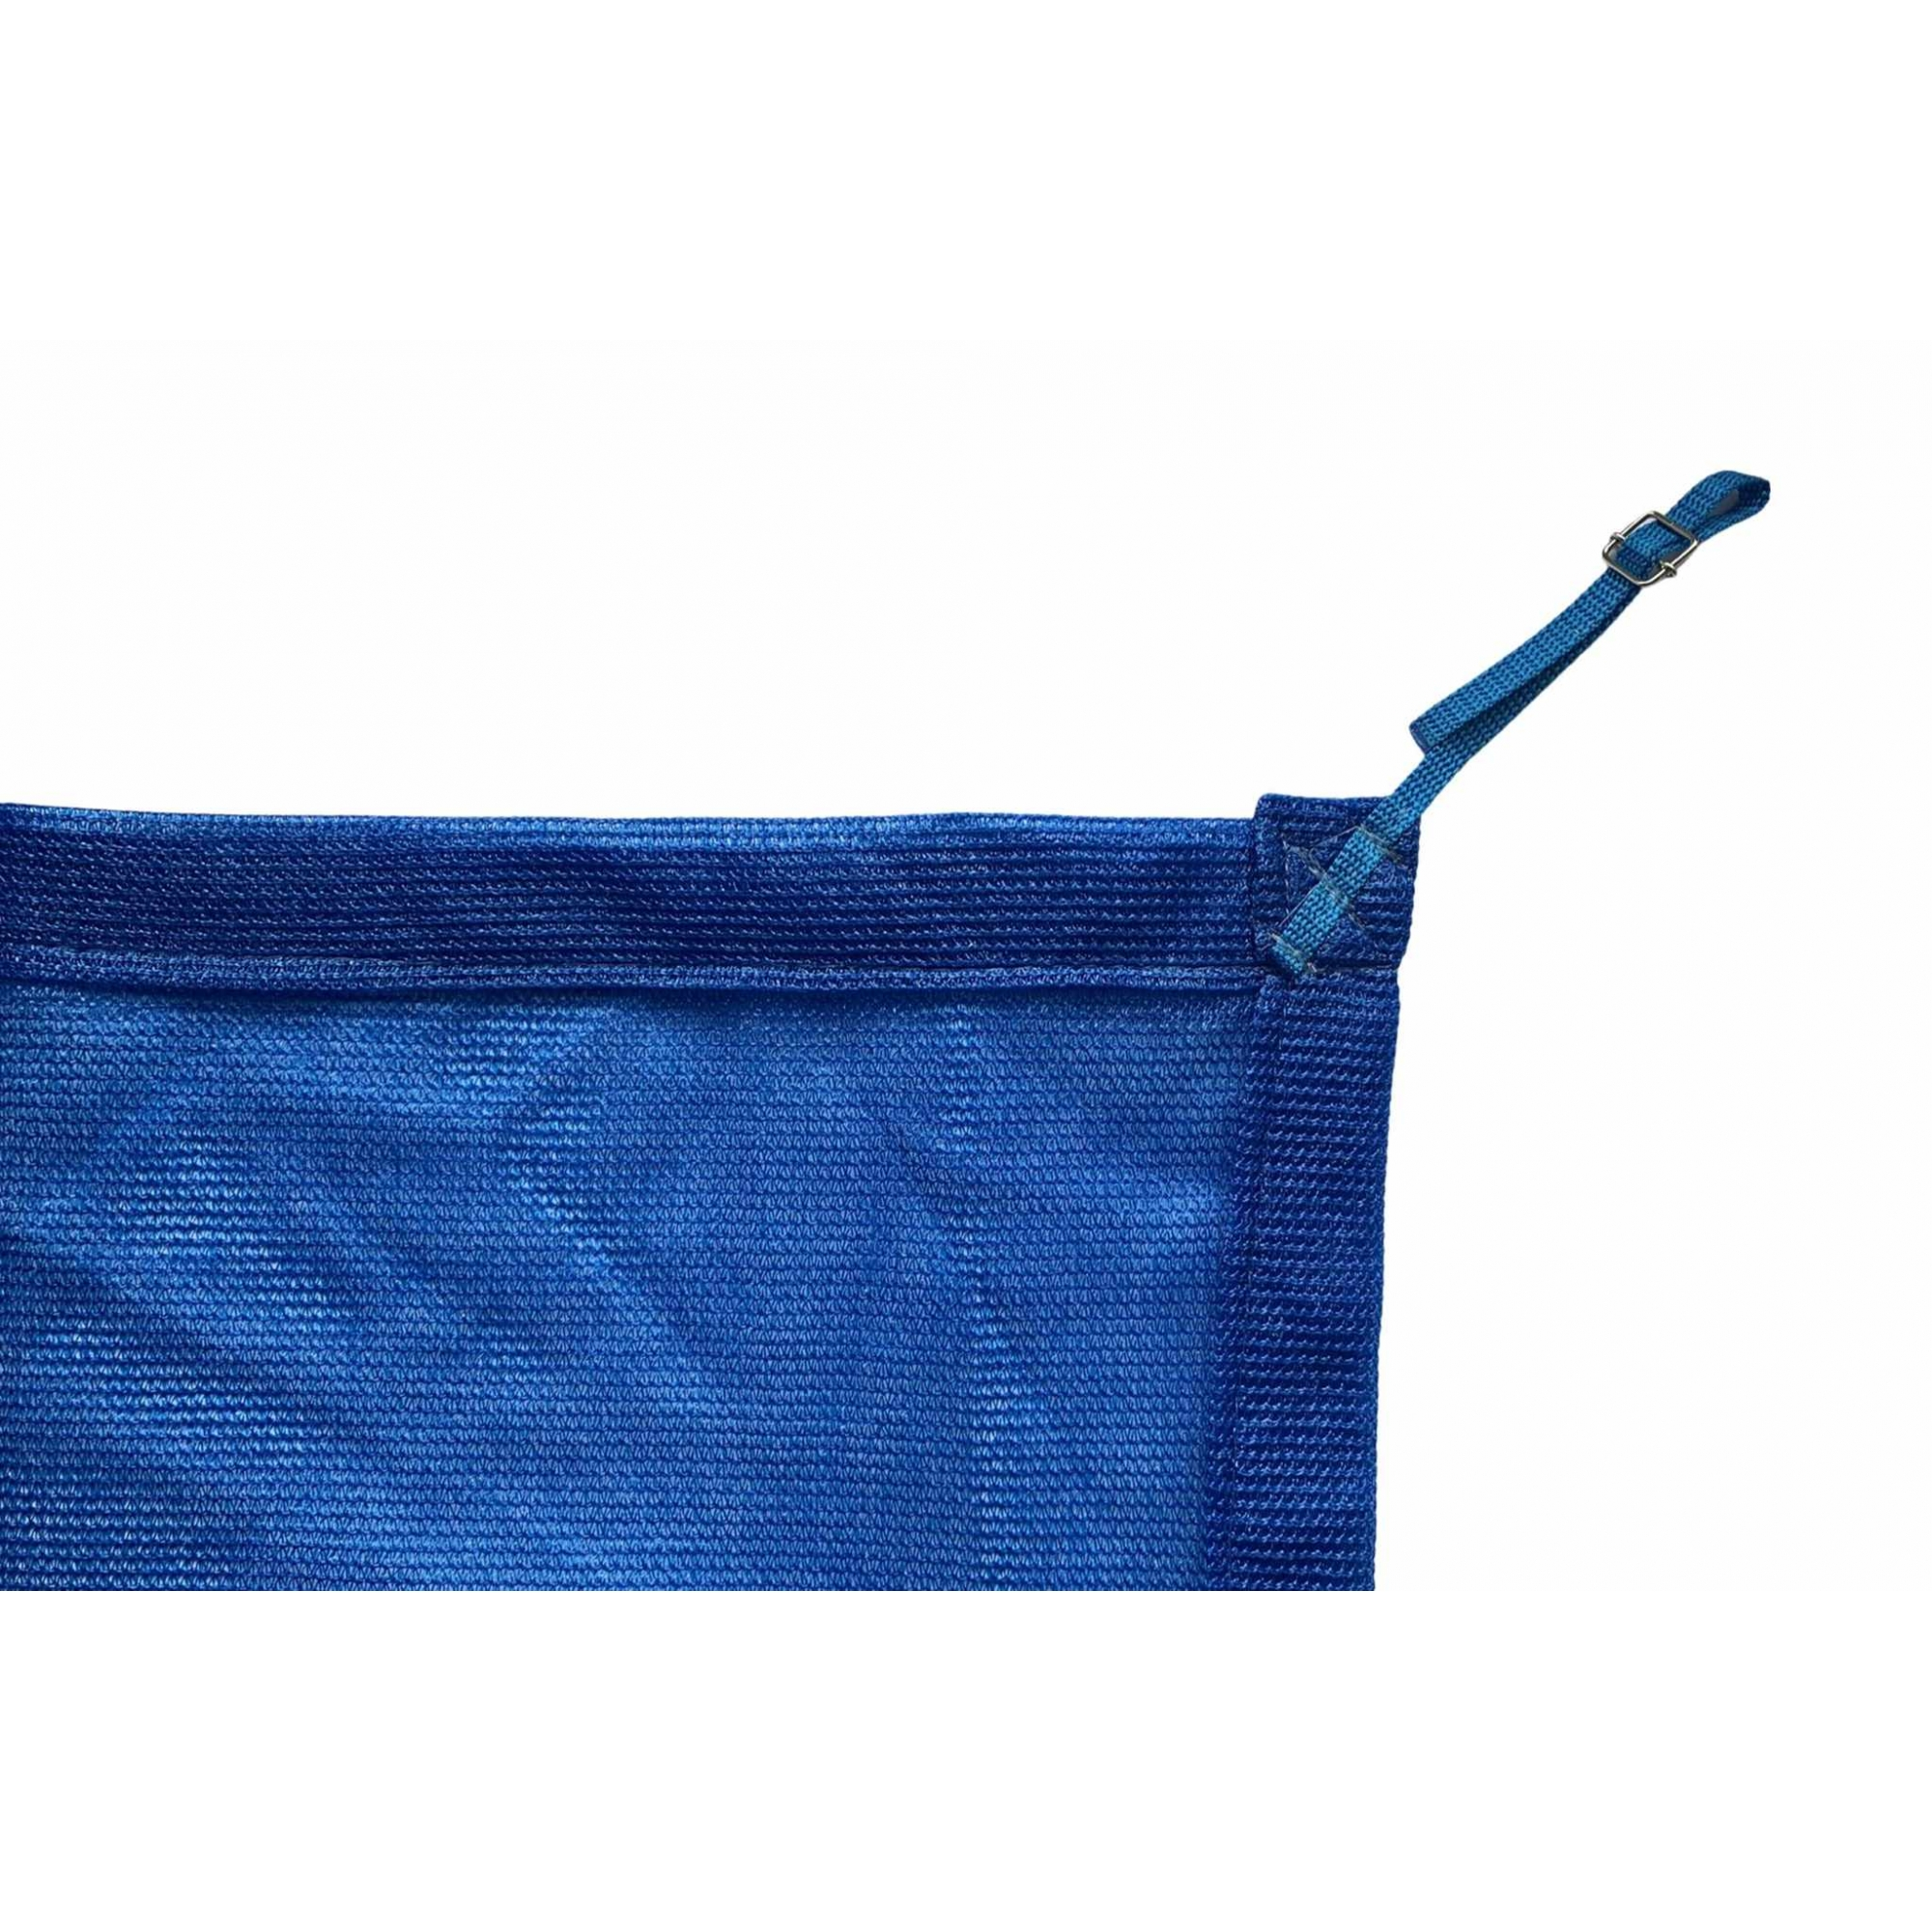 Tela de Sombreamento 80% Azul com Esticadores - Largura: 2 Metros